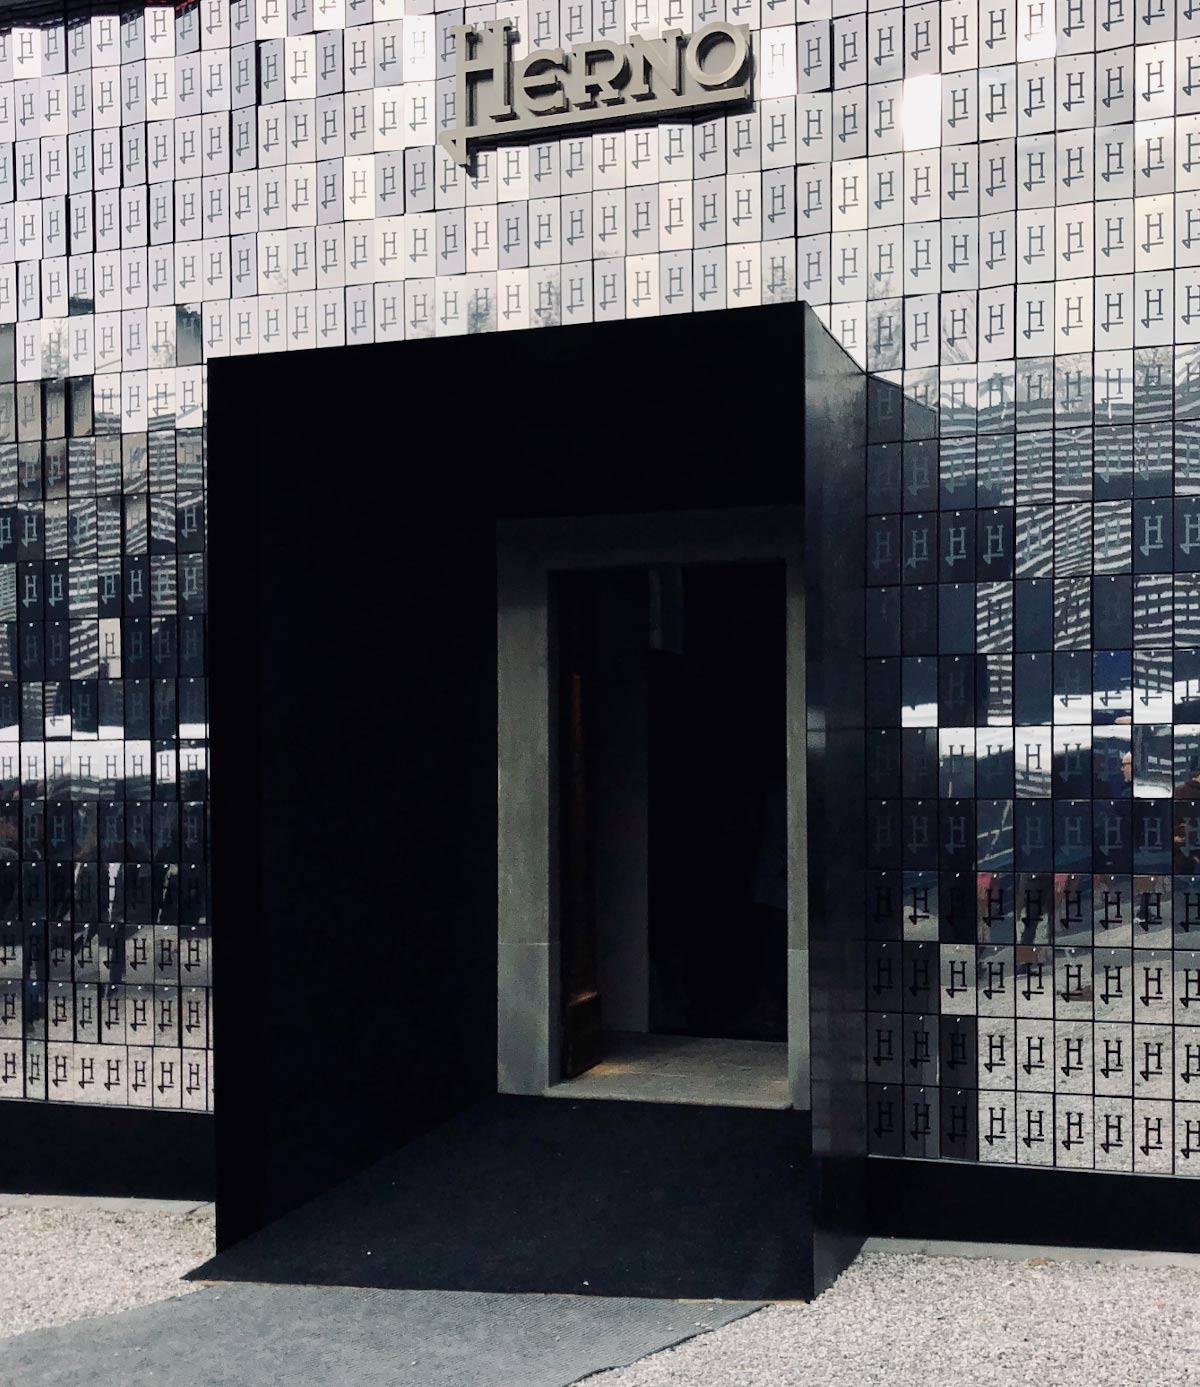 herno_firenze_entrance-1